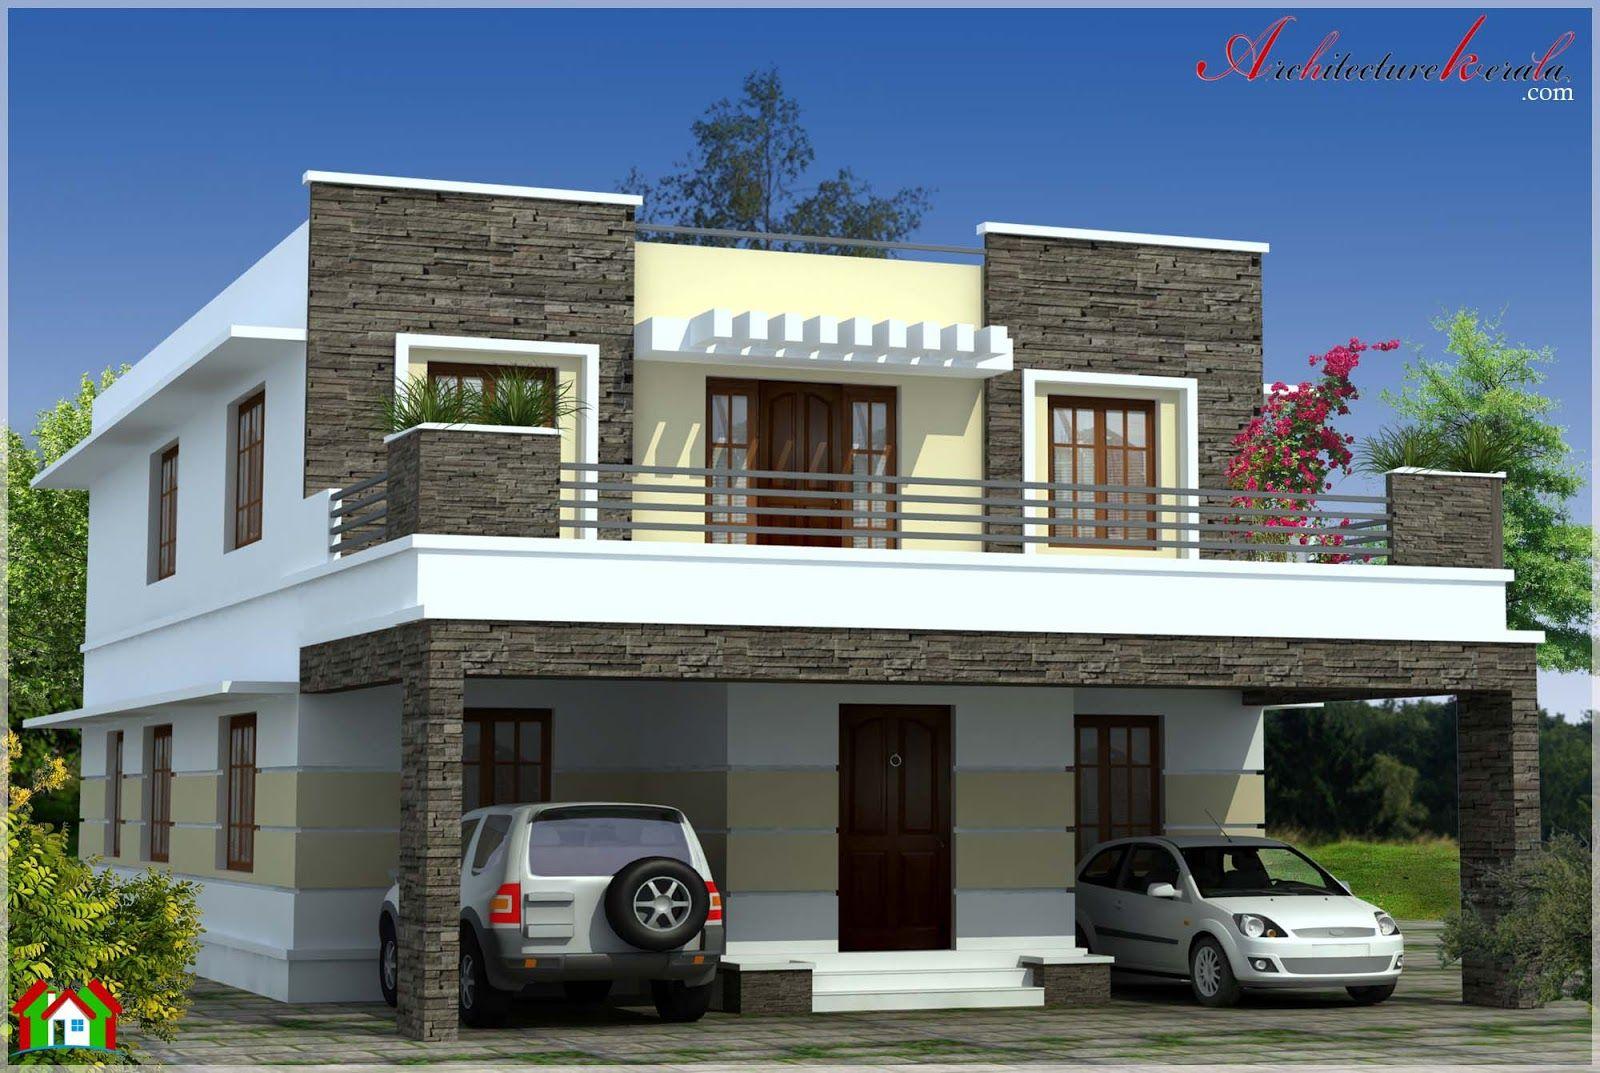 5066cdecd225cf655b6a190a660c162b - 46+ Simple Terrace Design For Small House  Pics